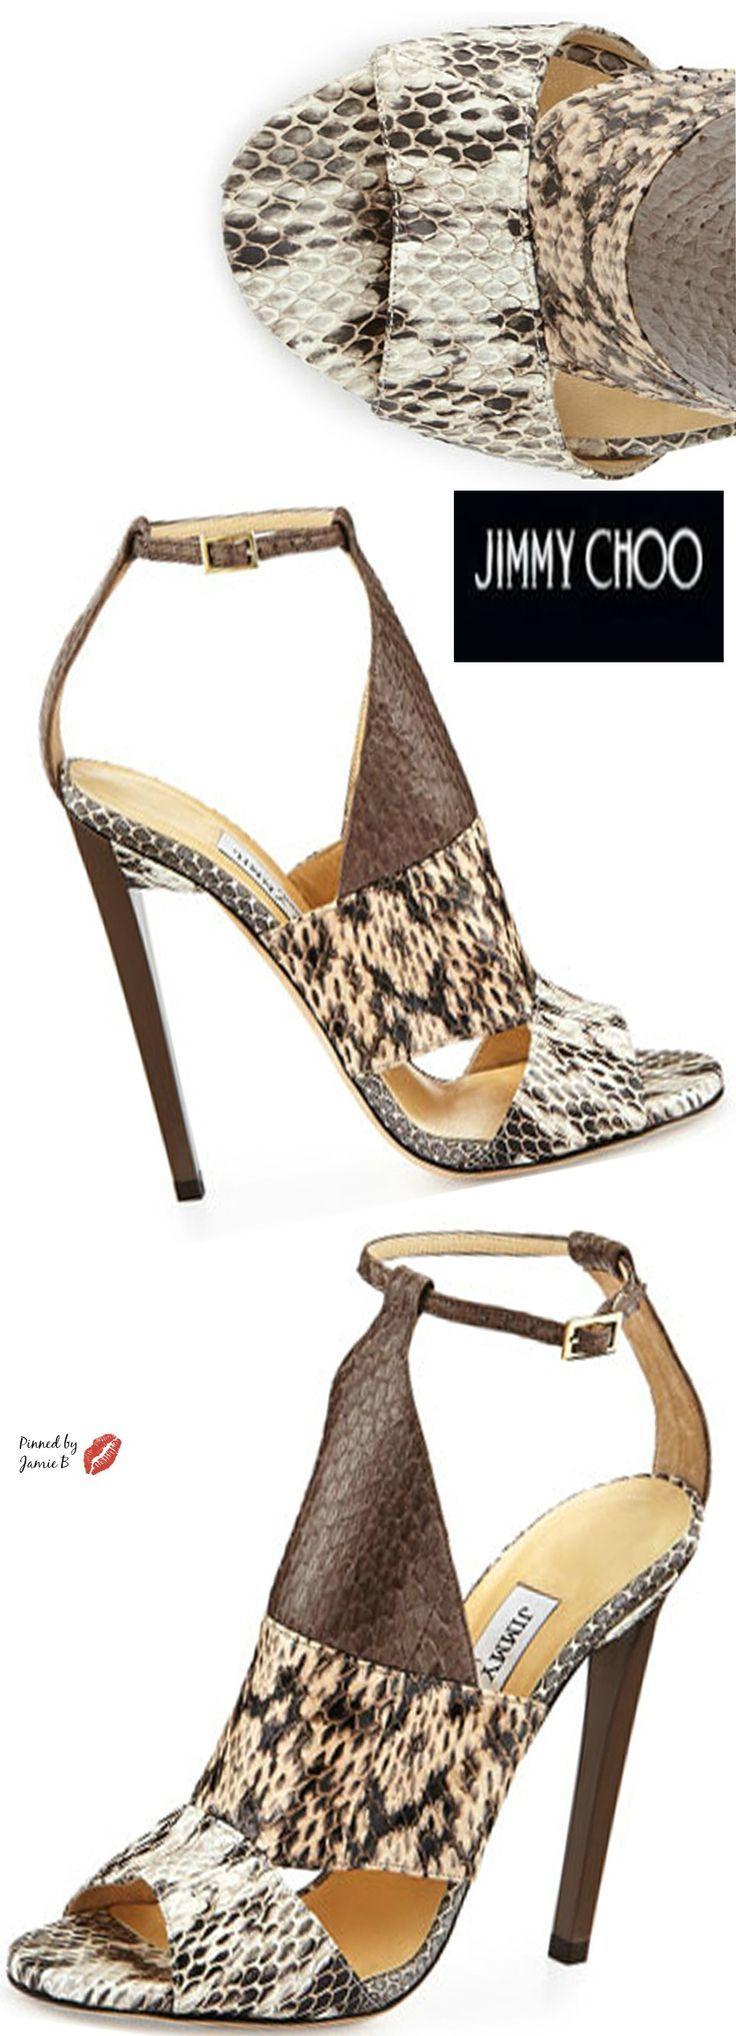 Jimmy Choo Woman Maya Two-tone Woven Leather Sandals Black Size 39 Jimmy Choo London Ngjlz